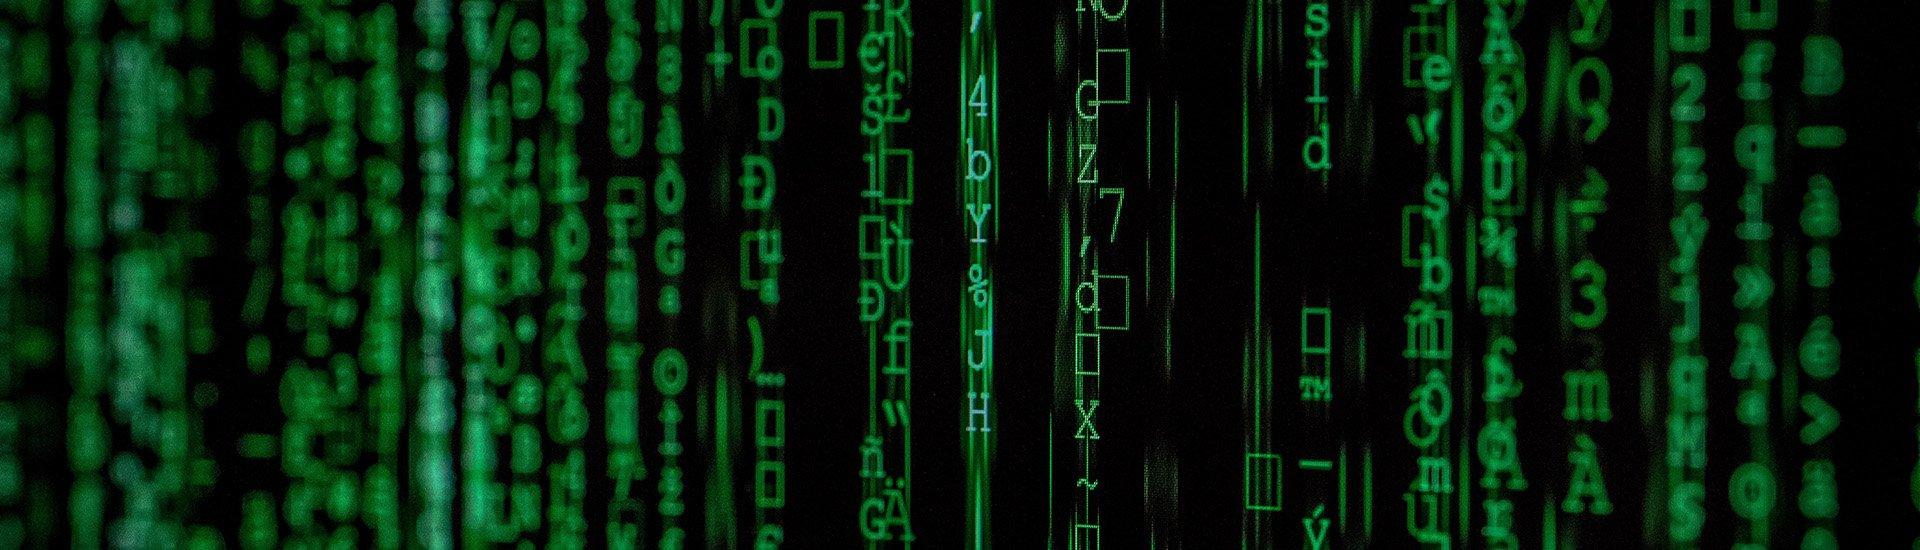 data-code-binary-matrix-style